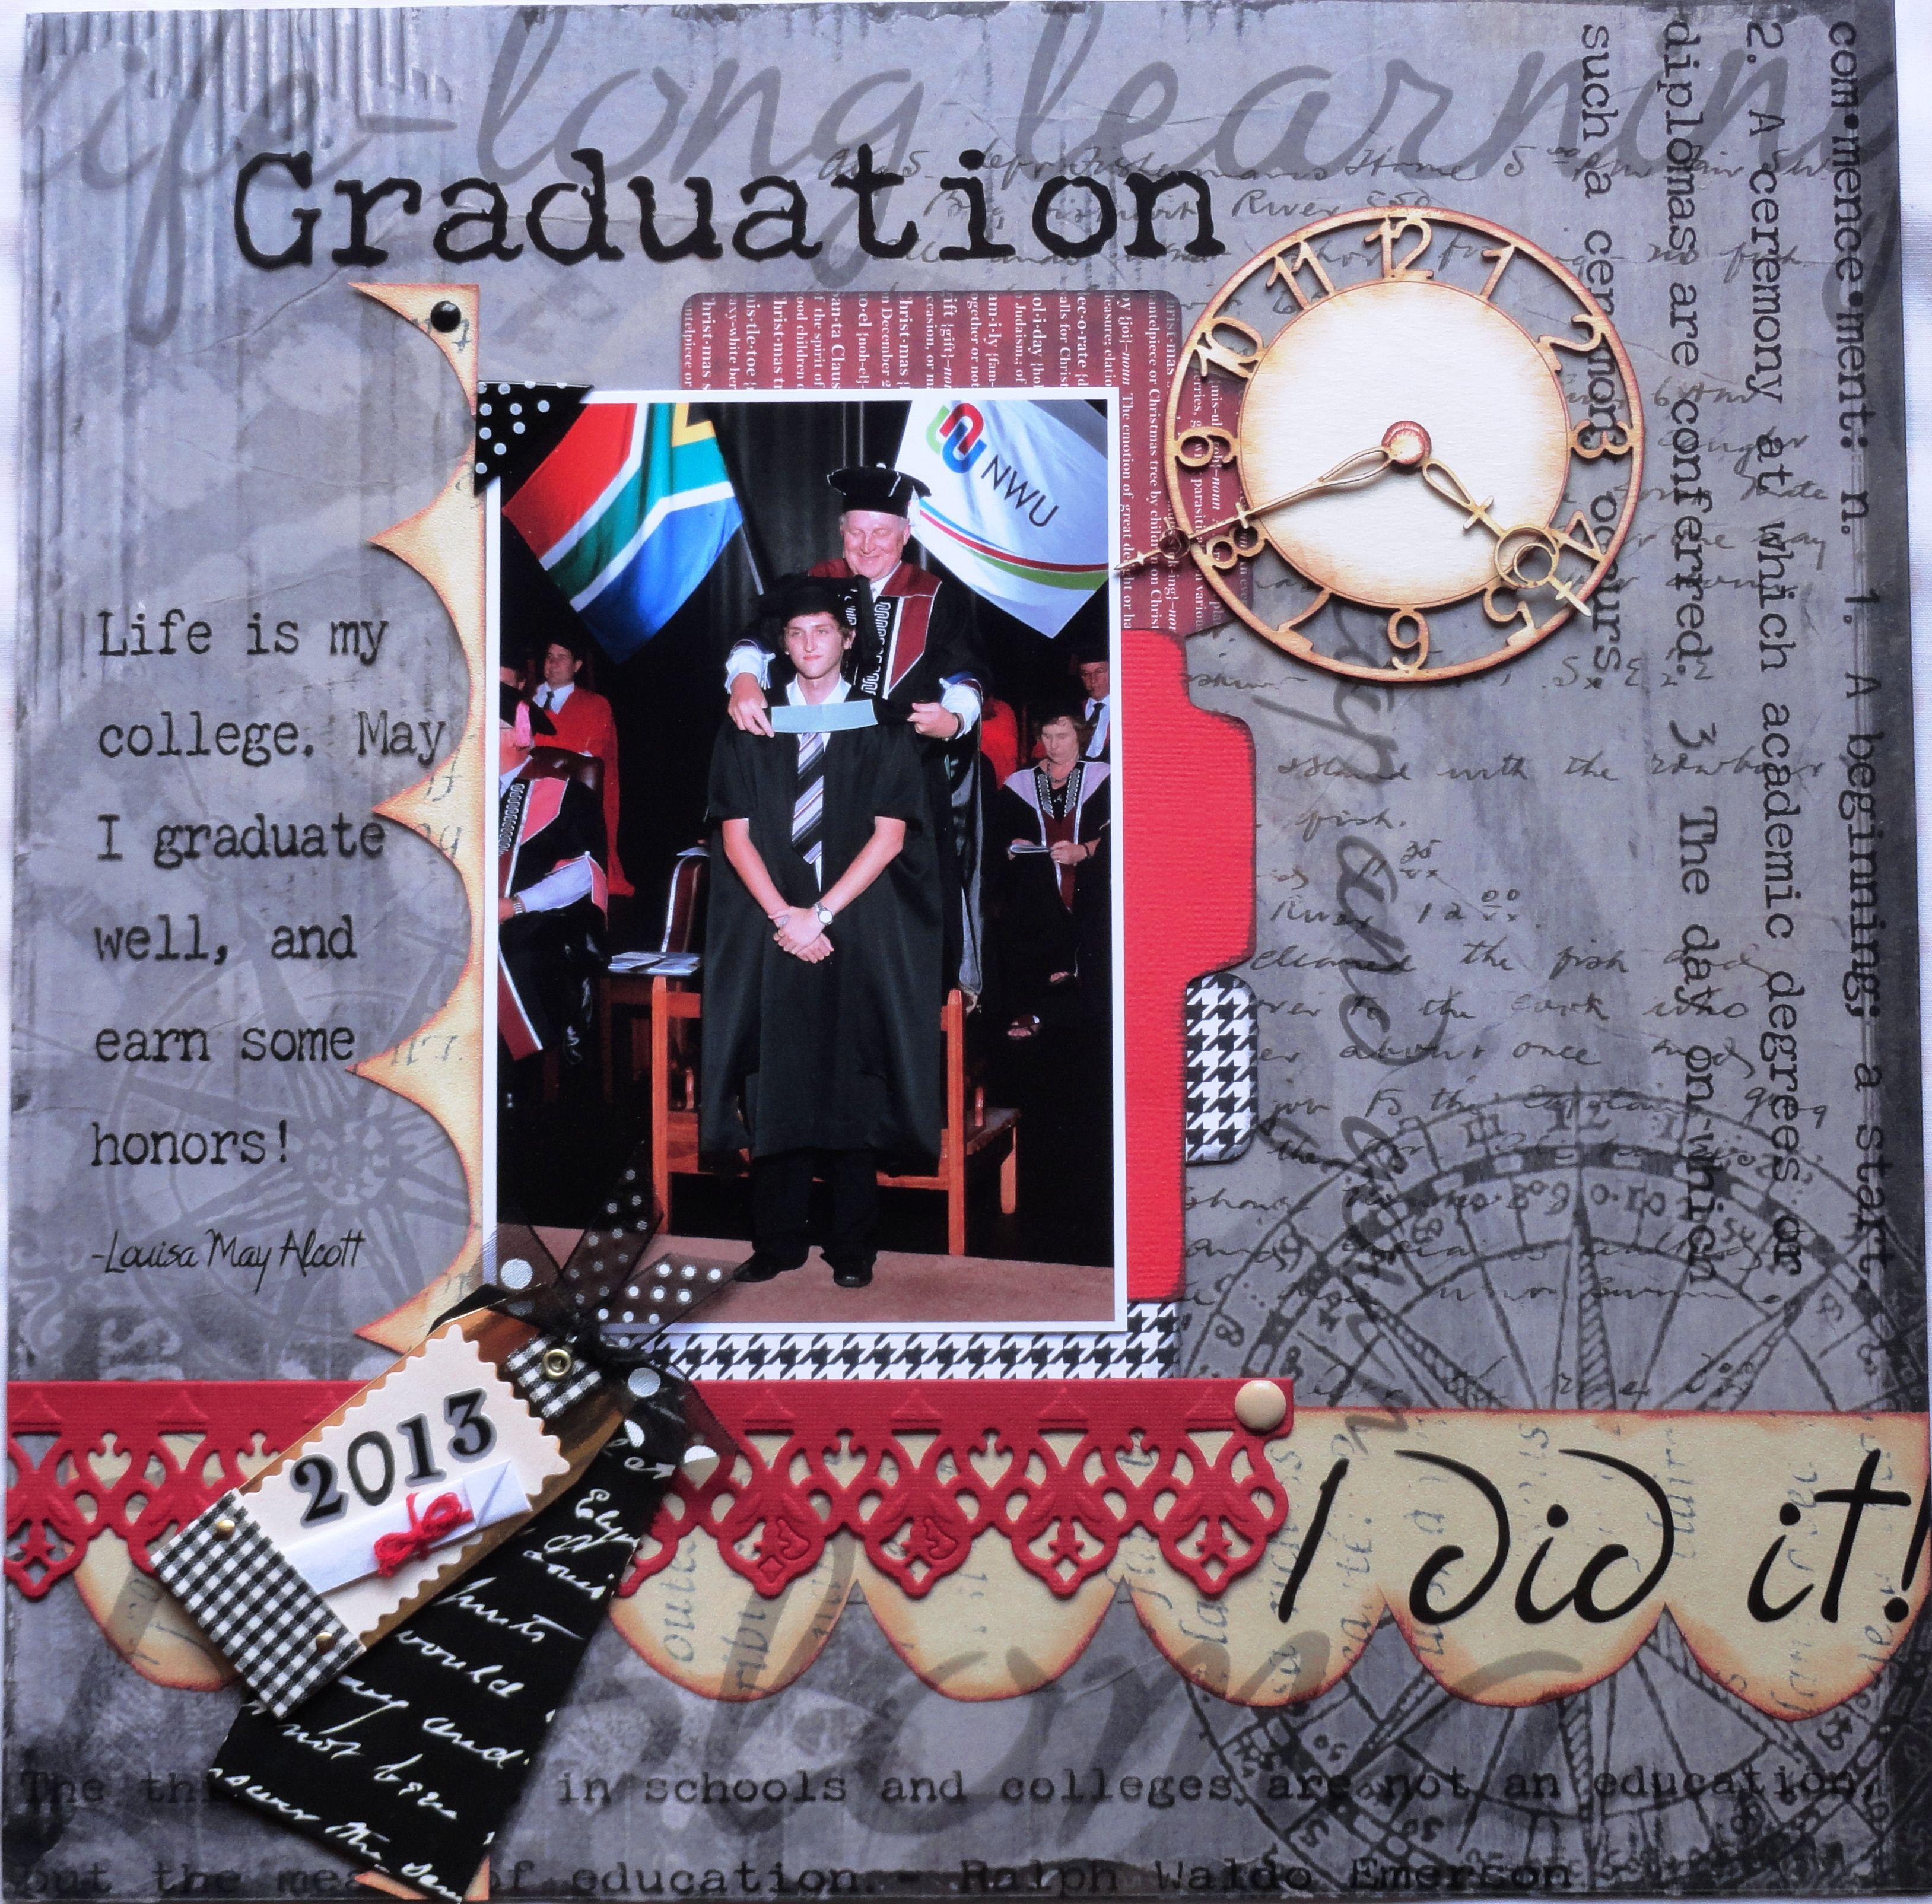 Graduation scrapbook ideas pinterest - Graduation Layout Scrapbooking Scrapbook Layouts Pinterest 3256x3209 Black White Graduation Scrapbook Layout 640x640